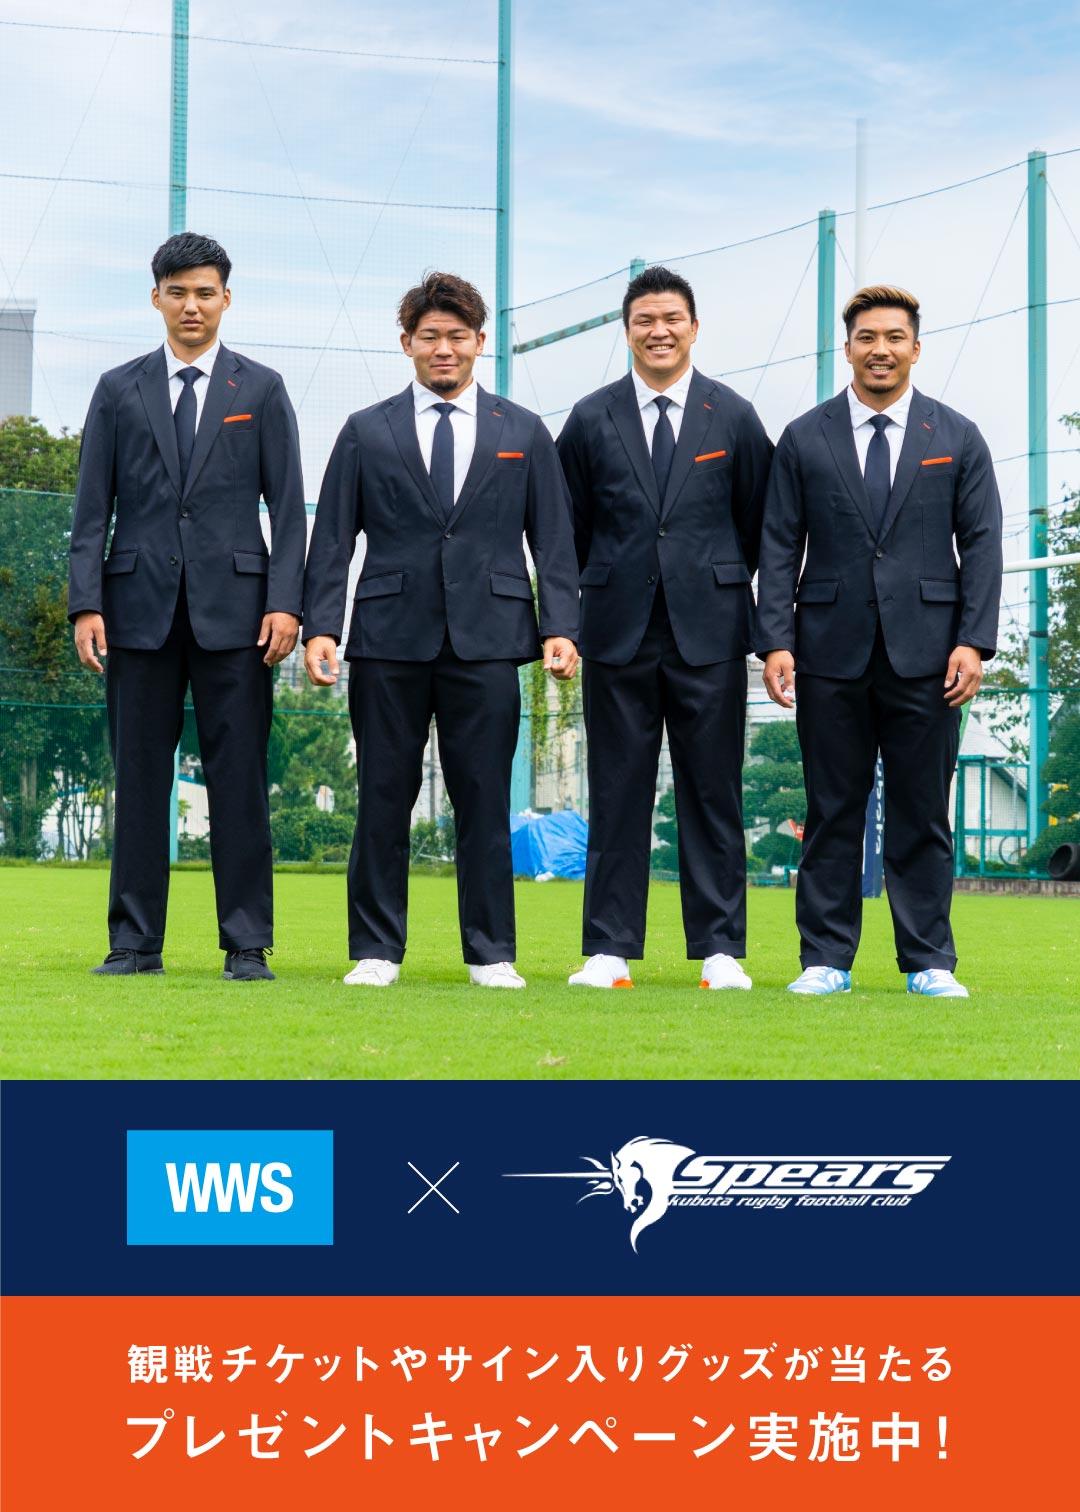 WWS x KUBOTA RUGBY FOOTBALL CLUB